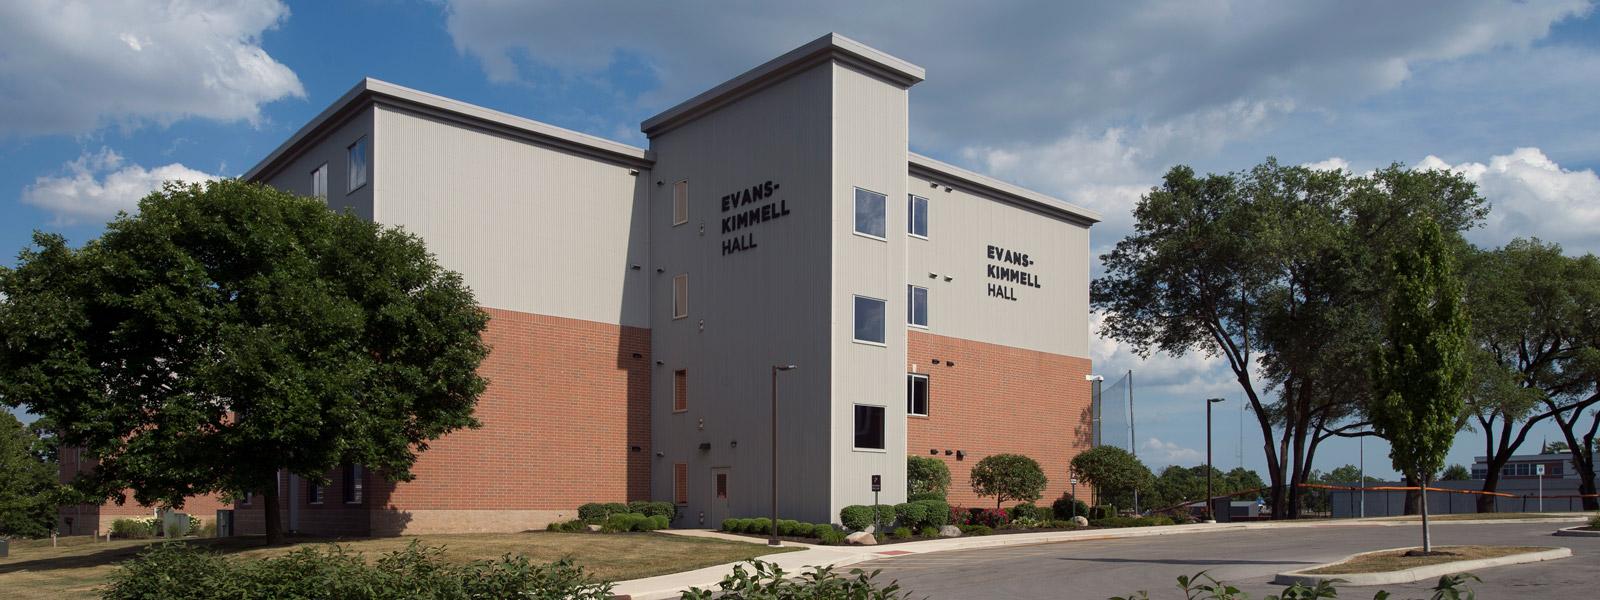 Evans-Kimmell Hall